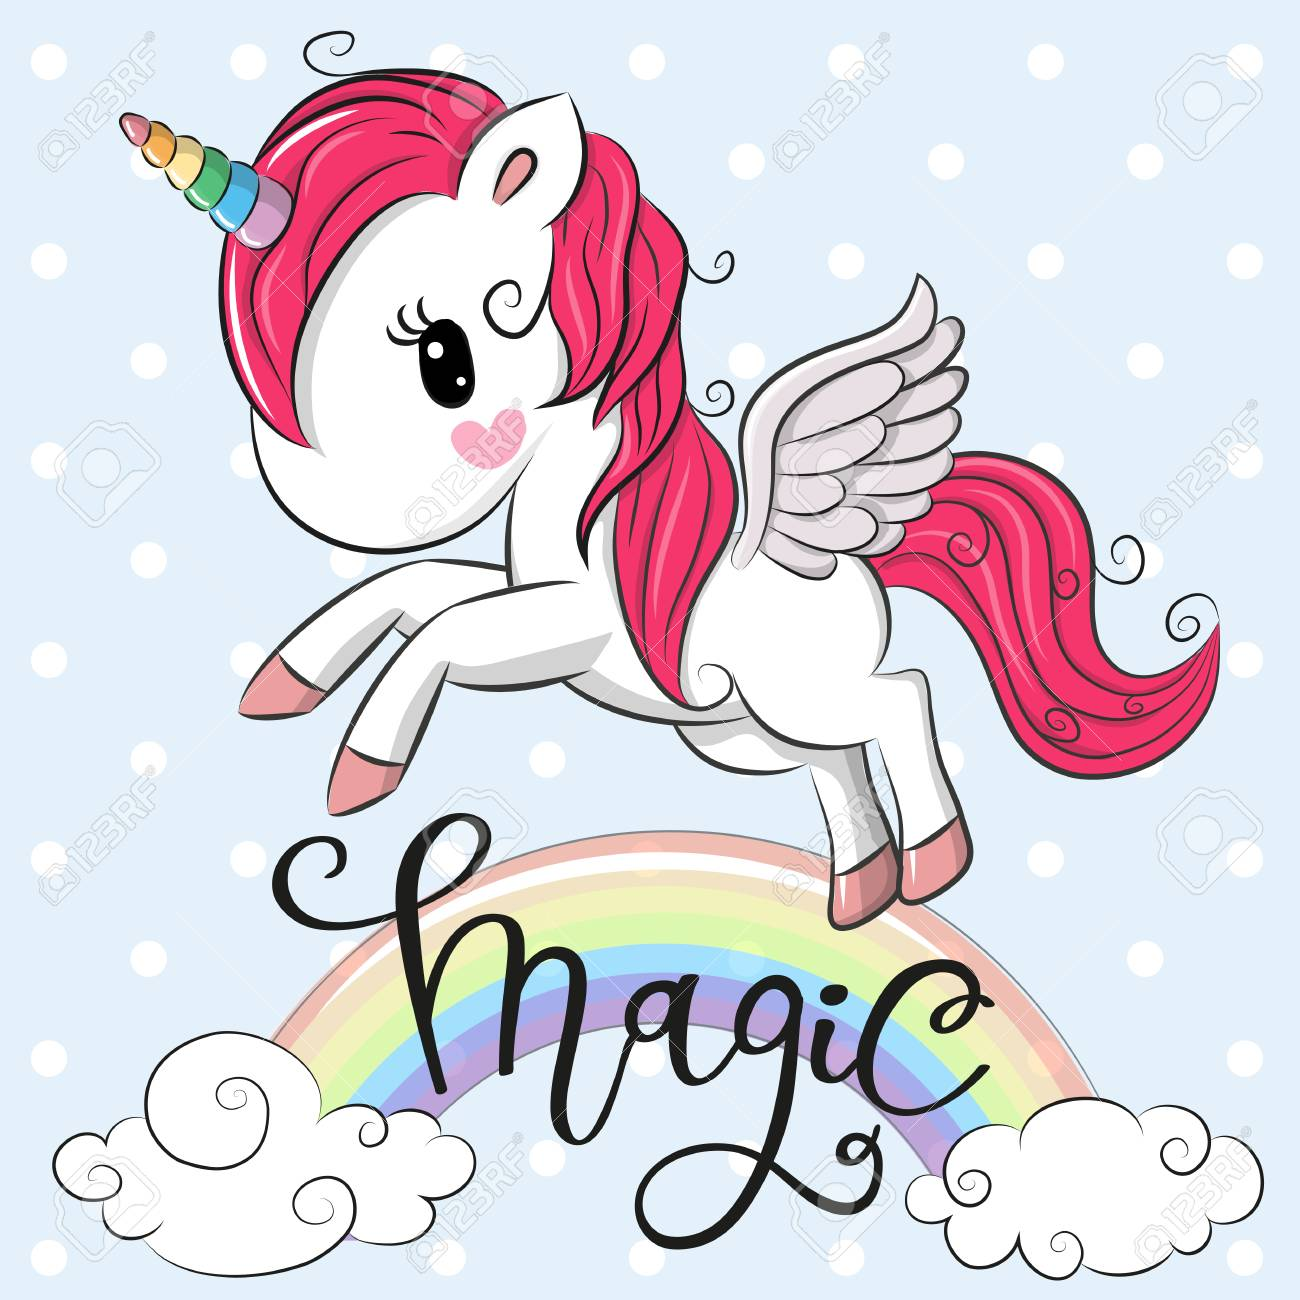 Cartoon Cartoon Unicorn is flying under the rainbow Vector illustration. - 98559662